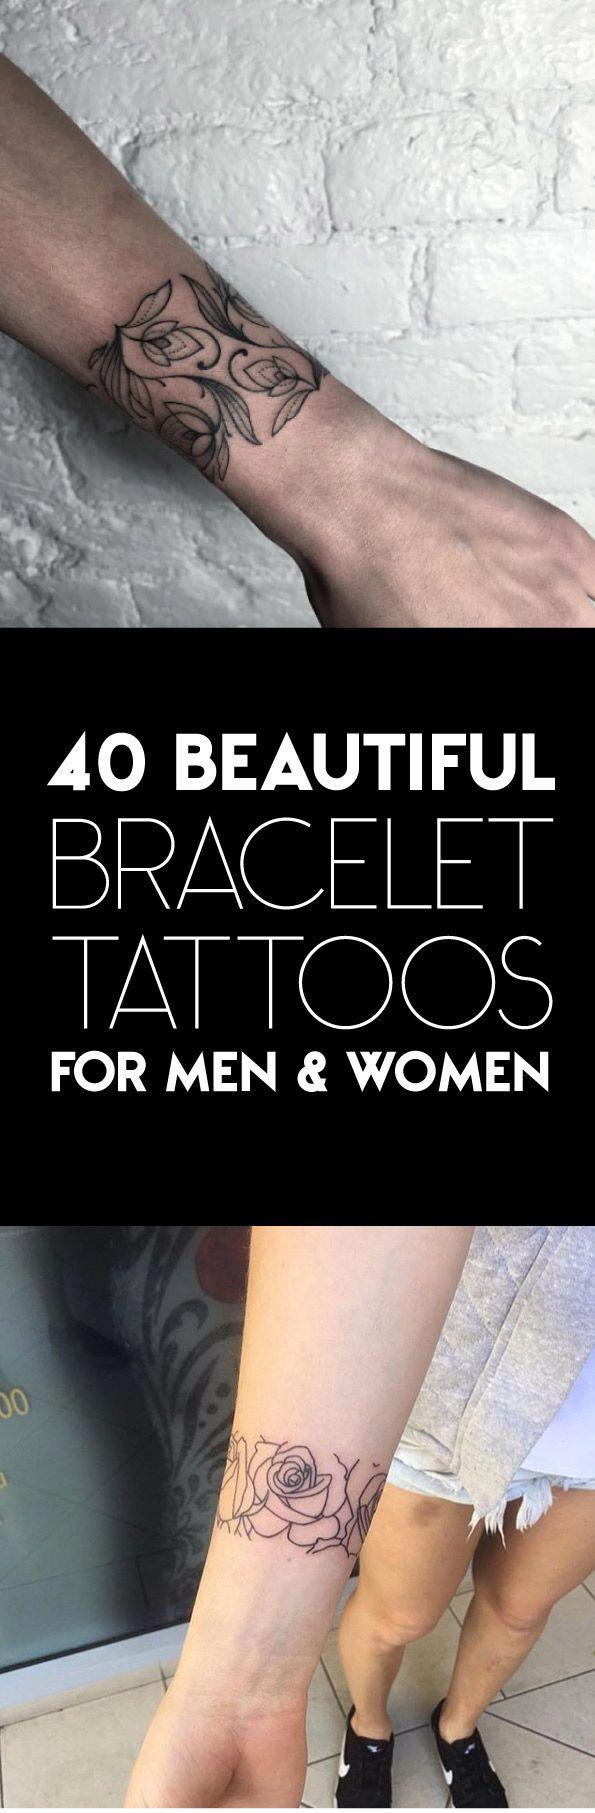 Sienna Miller | Tattoos - Celebrities ☠ | Tattoos gallery ...